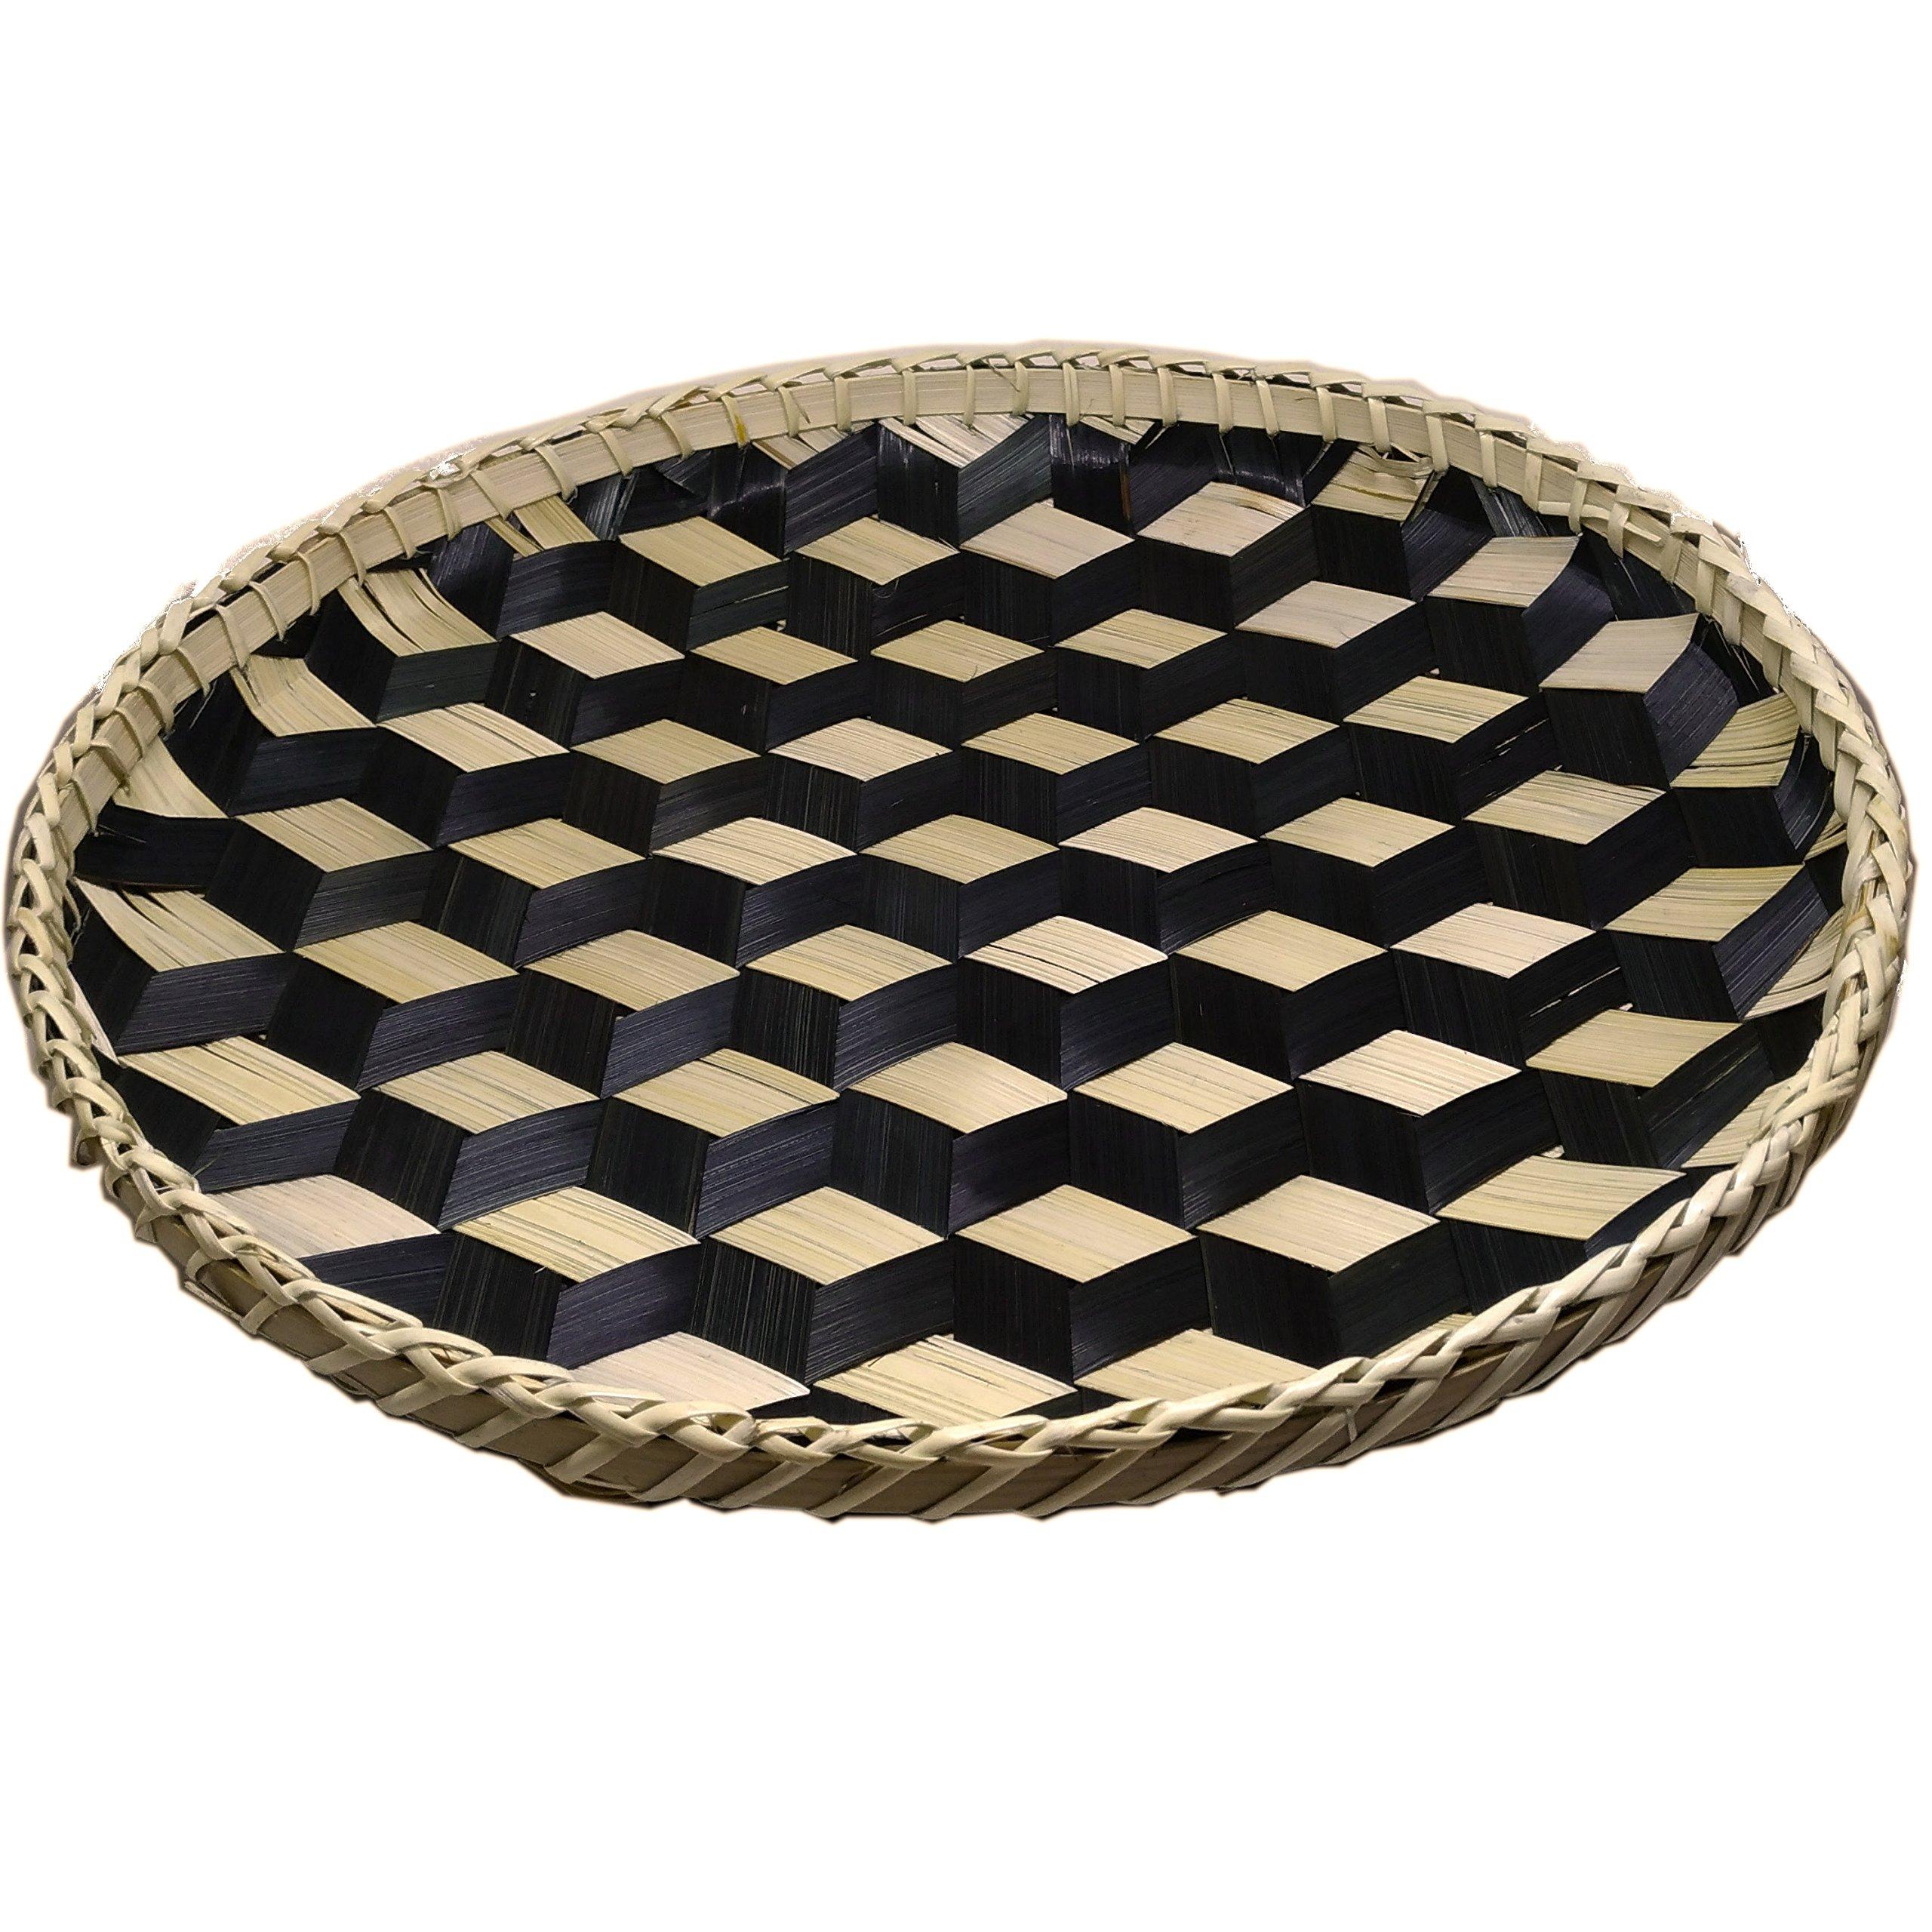 Ann Lee Designs X-Large Handmade Round Basket Tray - Black